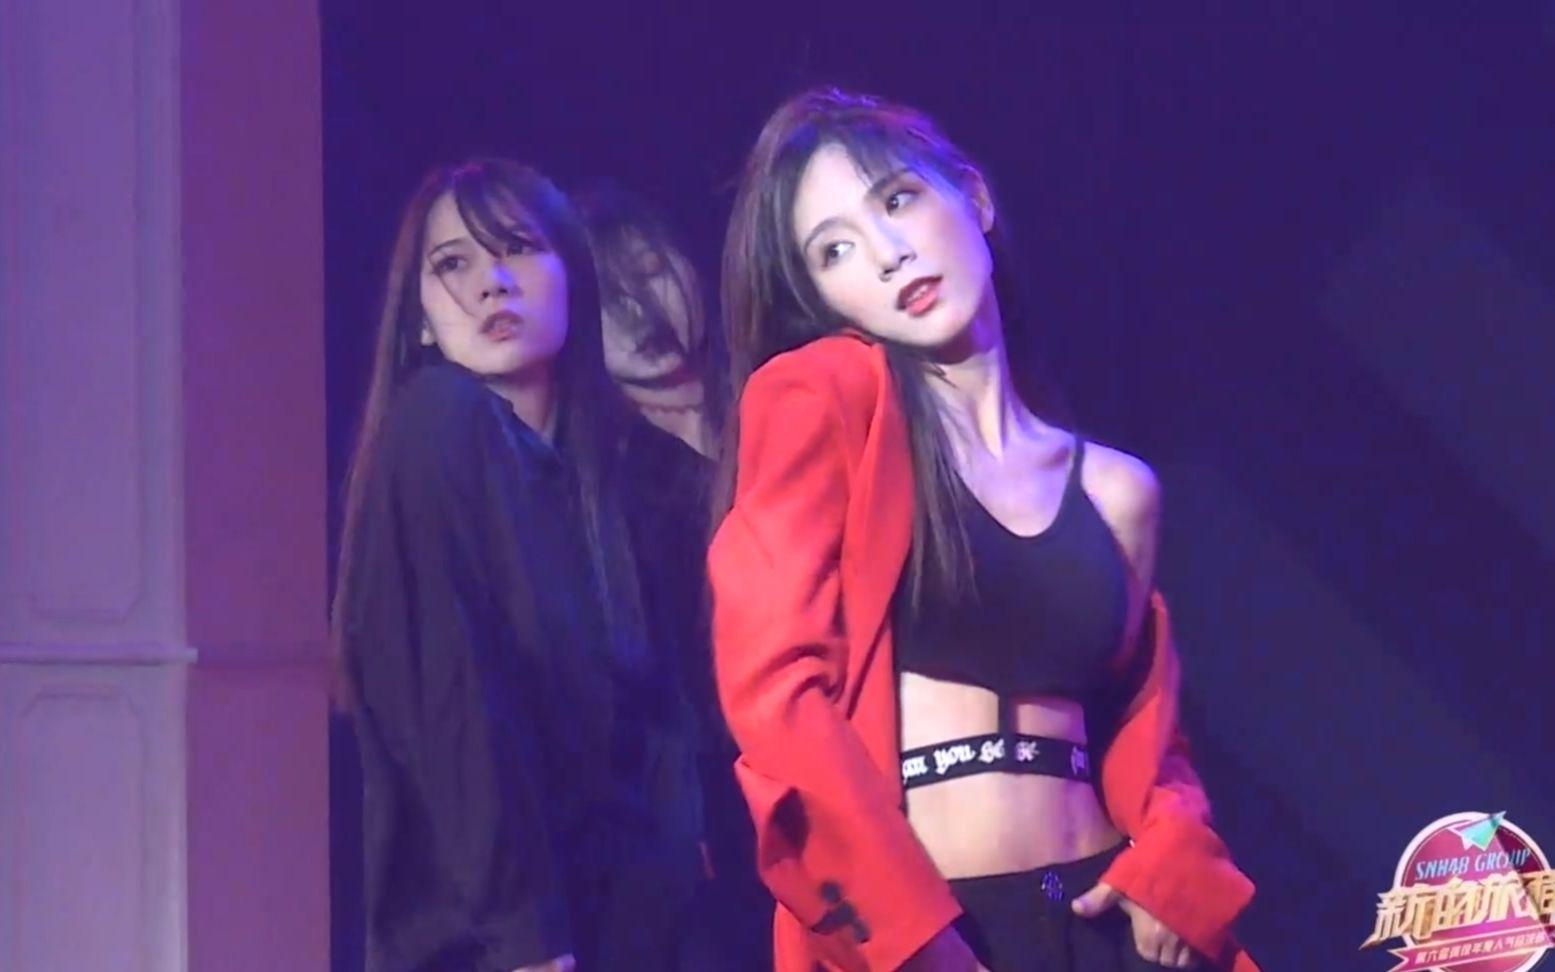 Love Shot 帅气舞蹈 (唐莉佳 龙亦瑞 谢菲菲 张秋怡 叶舒淇) +PV